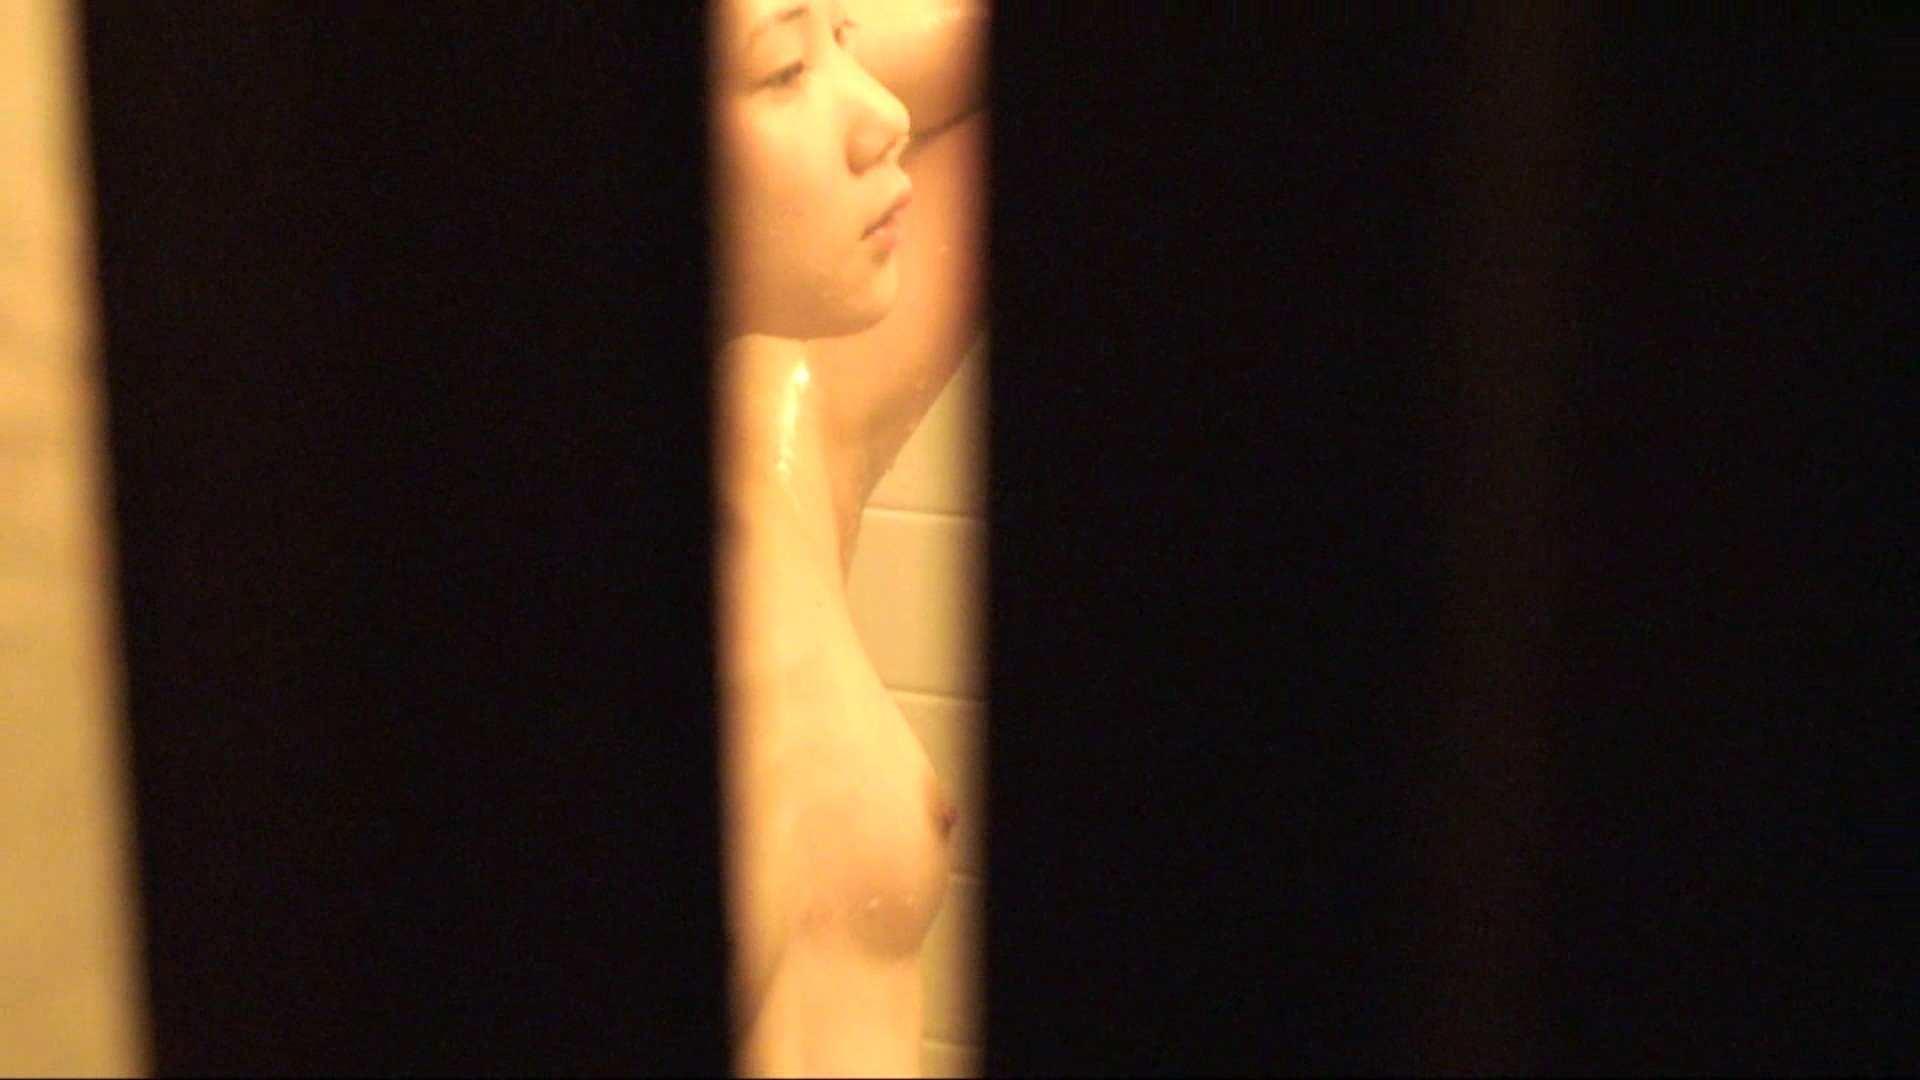 vol.02超可愛すぎる彼女の裸体をハイビジョンで!至近距離での眺め最高! 民家  54pic 45